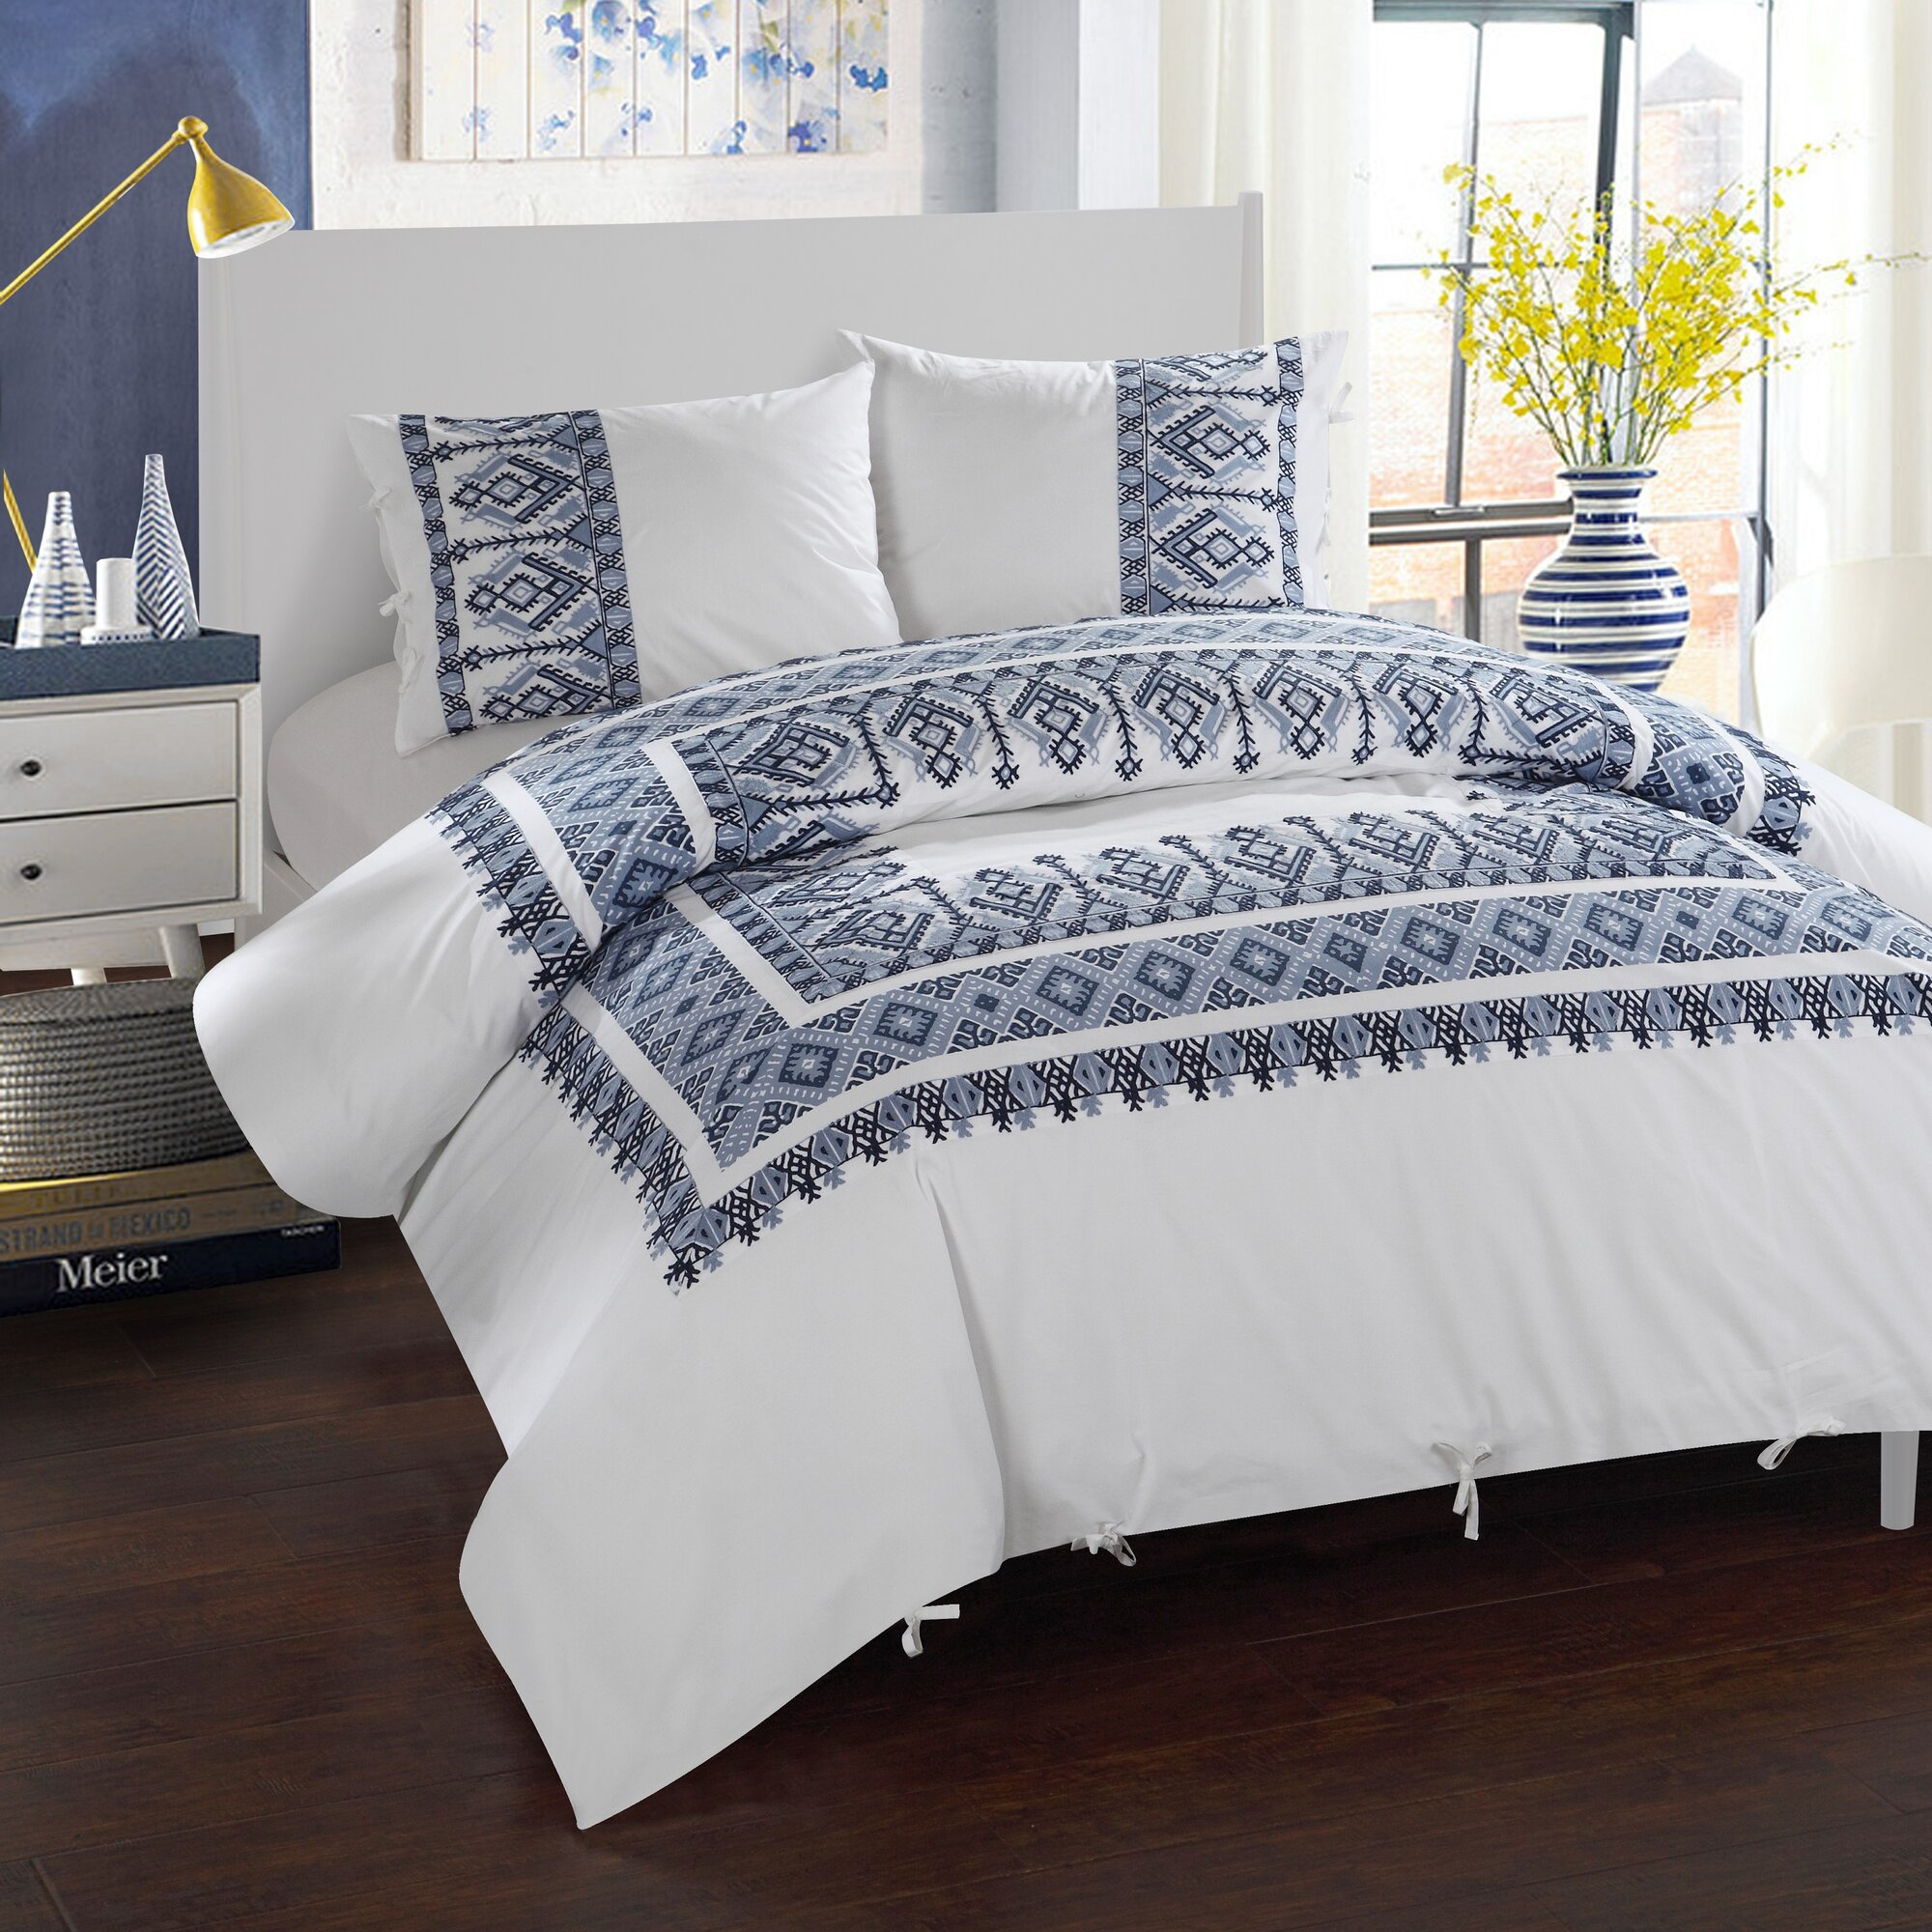 Ribbon embroidery bedspread designs - 3 Piece Sarita Garden Aztec Ribbon Embroidered Duvet Cover Set